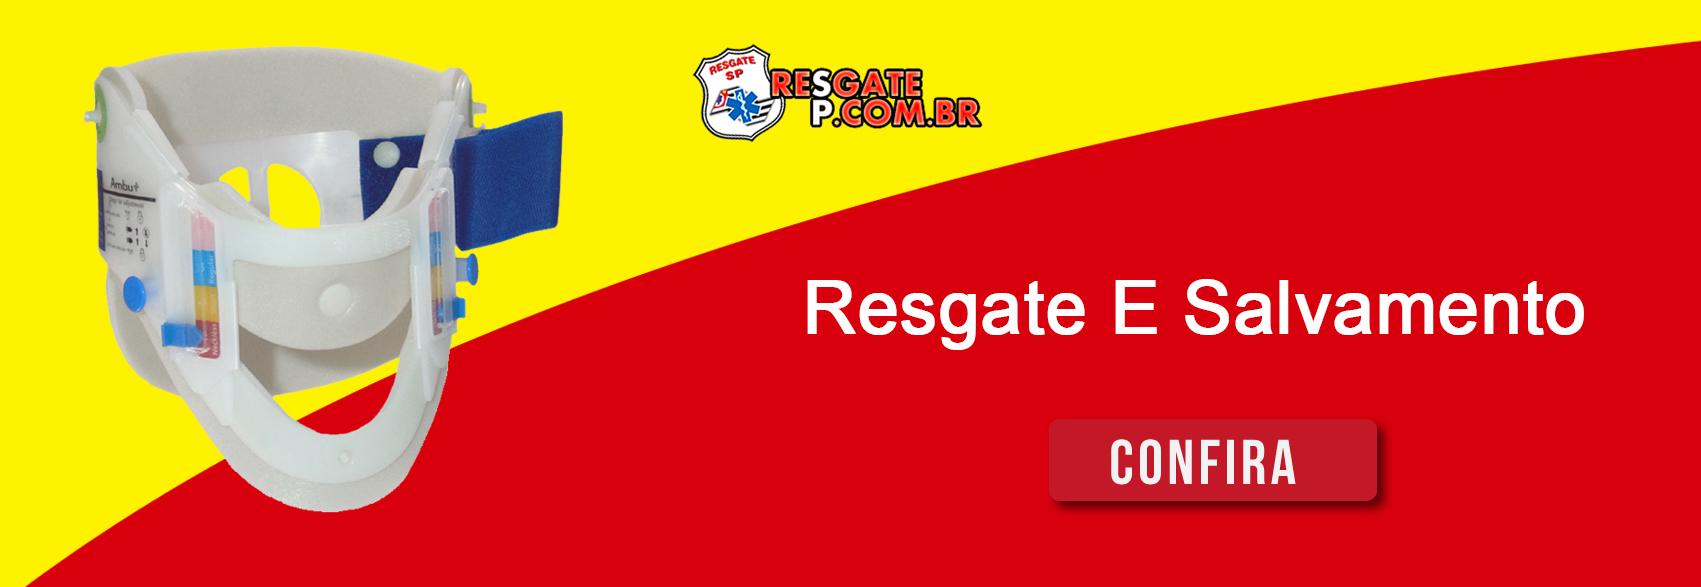 Resgate Desktop